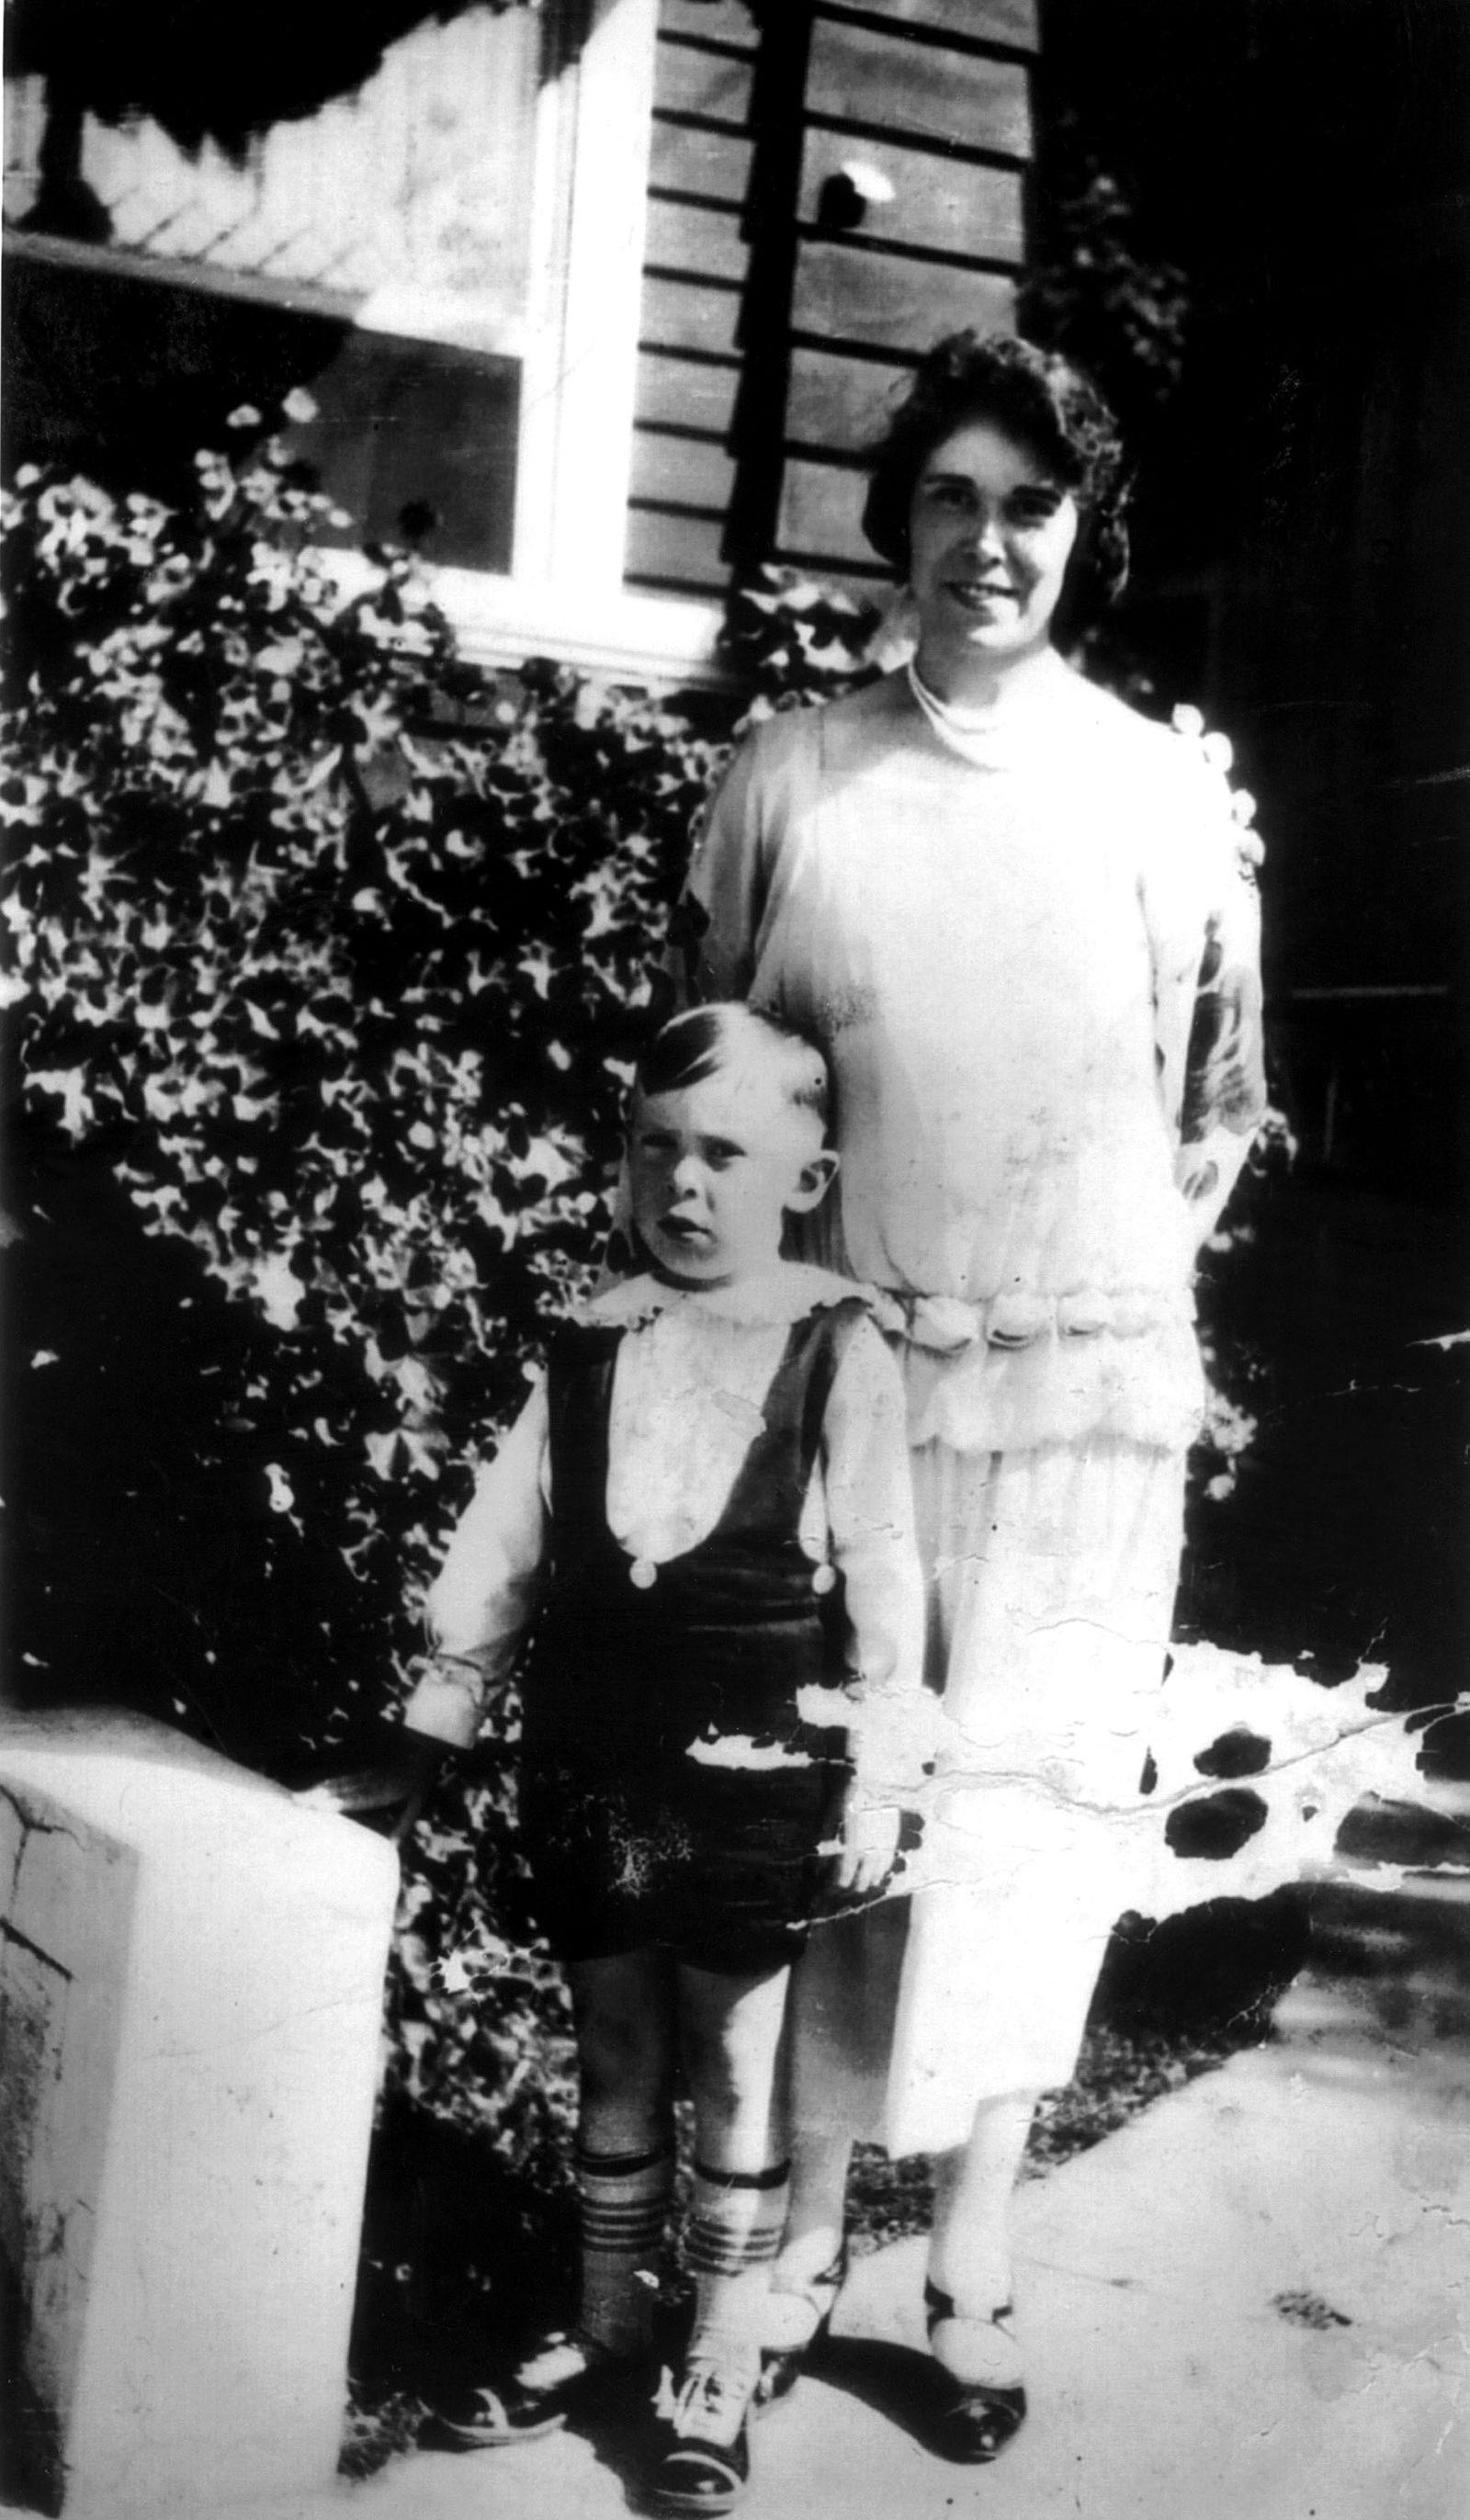 BUKOWSKI: BORN INTO THIS, Charles Bukowski, Charles Bukowski's mother, 2004, (c) Magnolia Pictures/c